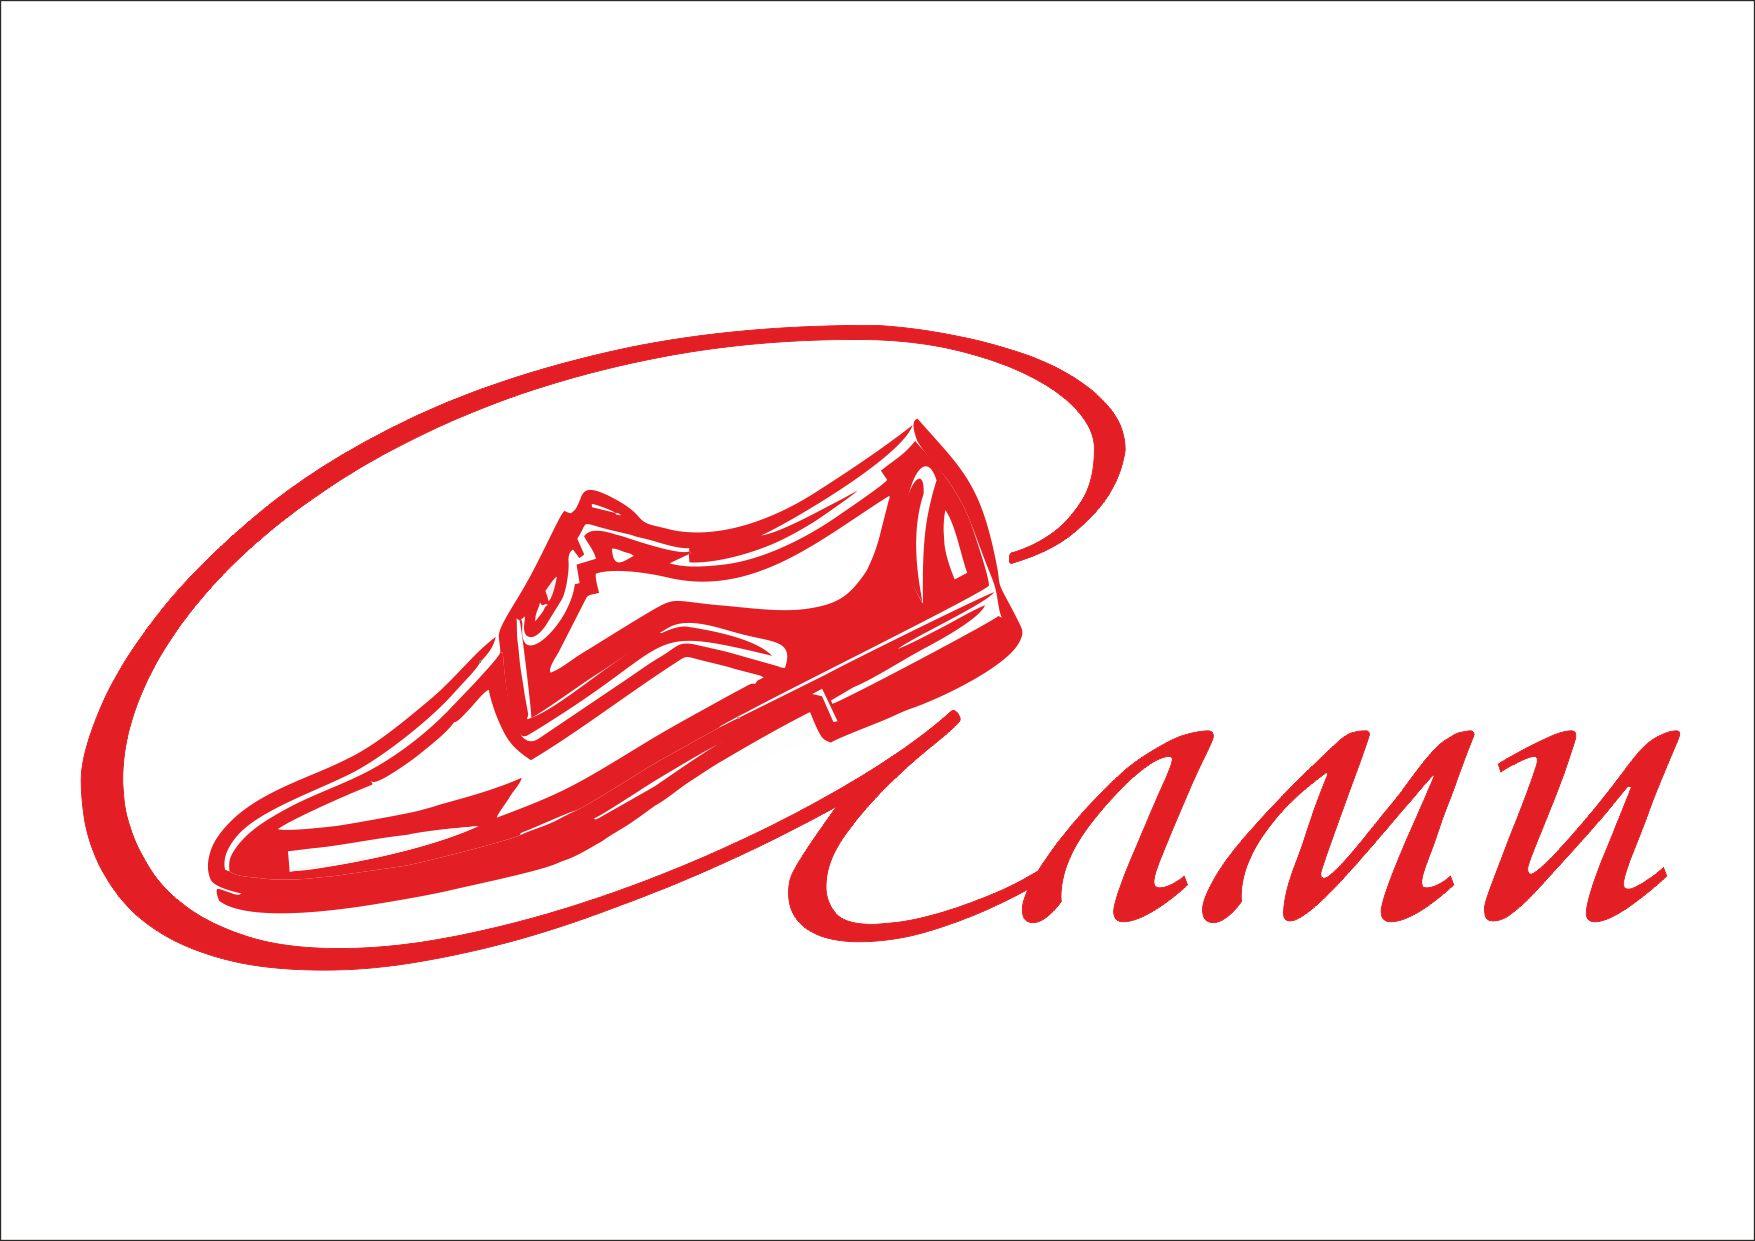 Дизайн логотипа обувной марки Алми фото f_90359d99a4be8f14.jpg